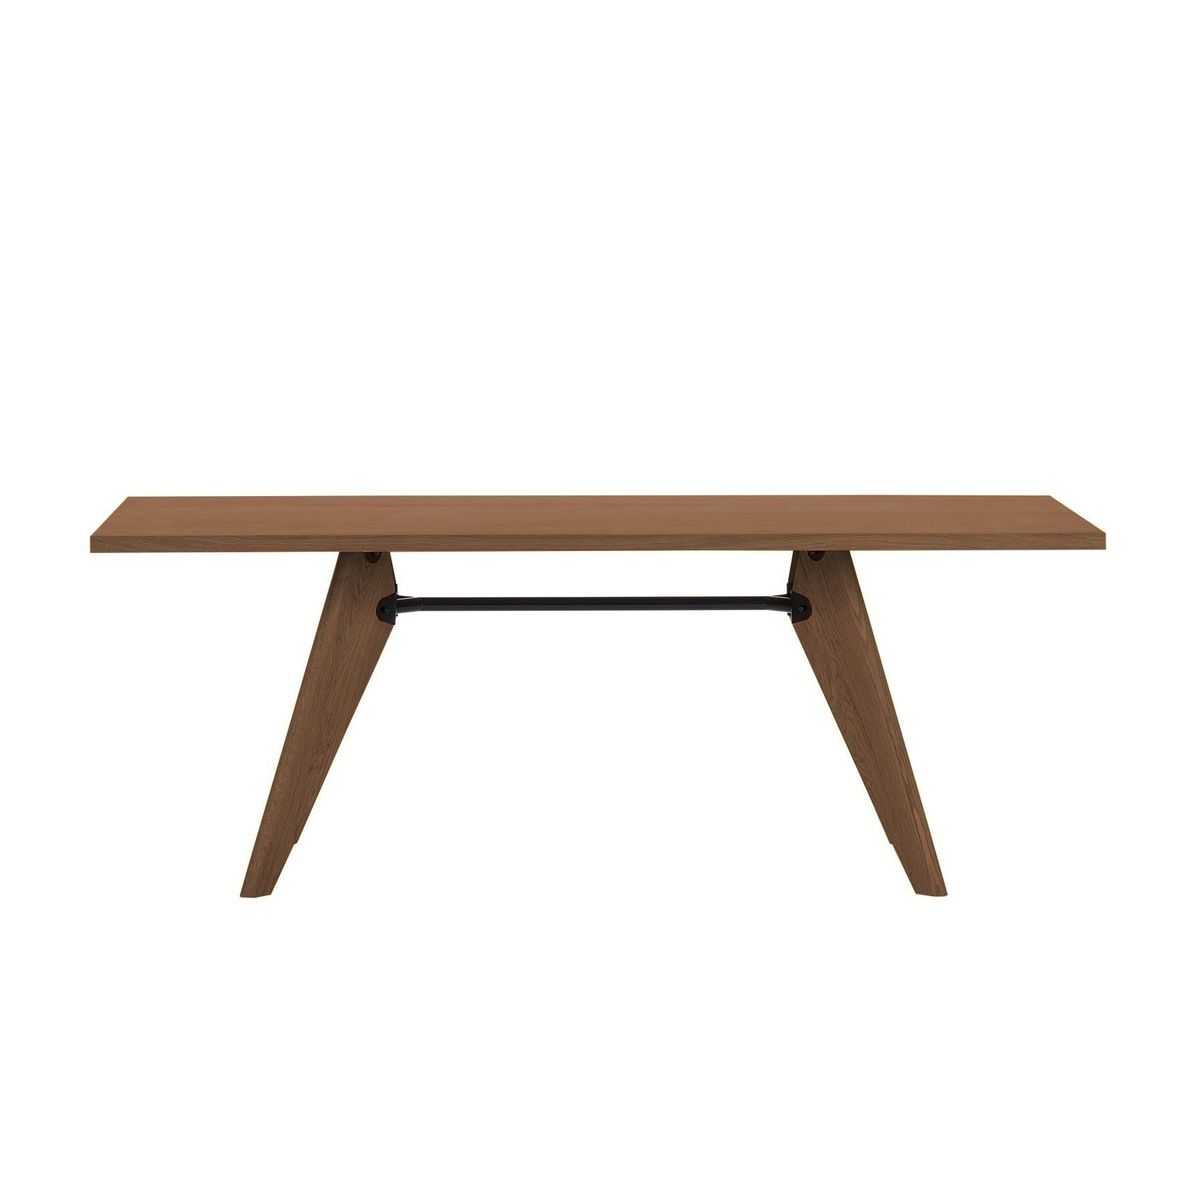 Table solvay prouv tisch vitra for Vitra tisch replica